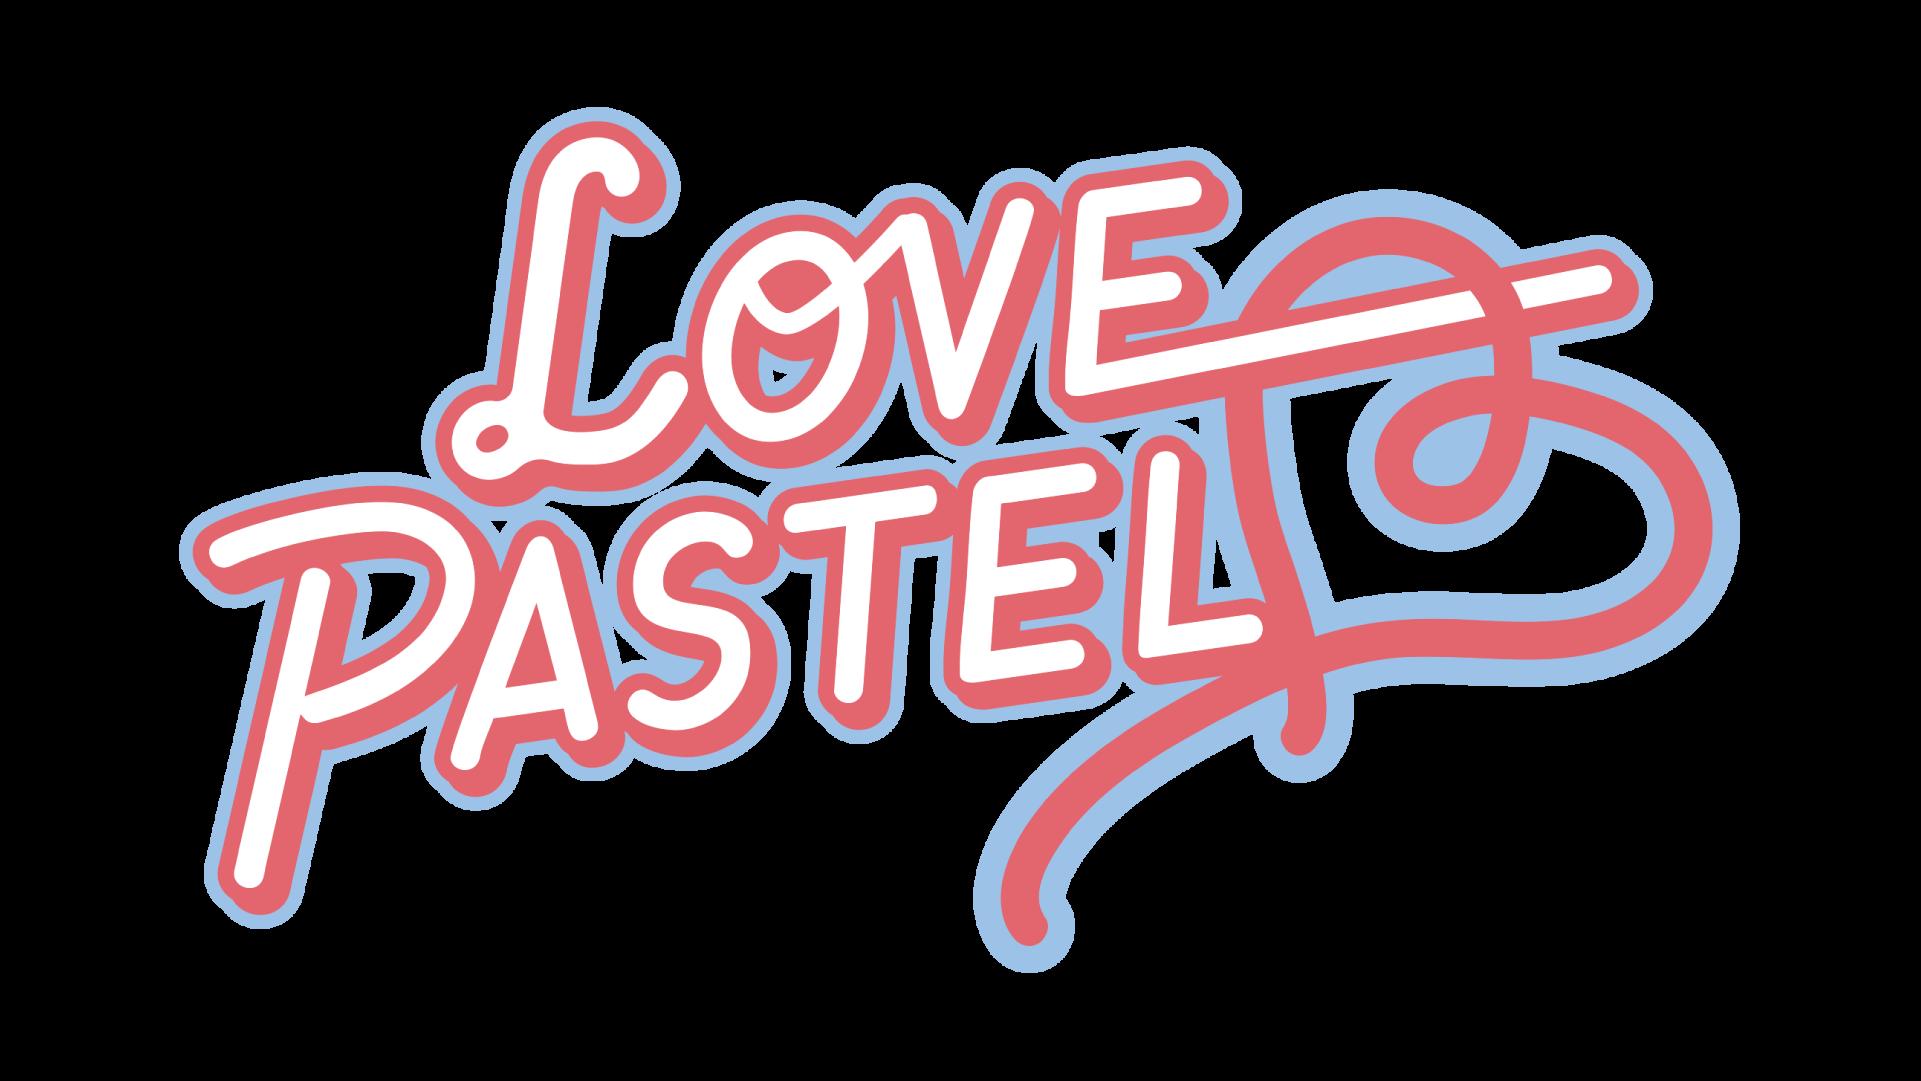 LOVE PASTEL